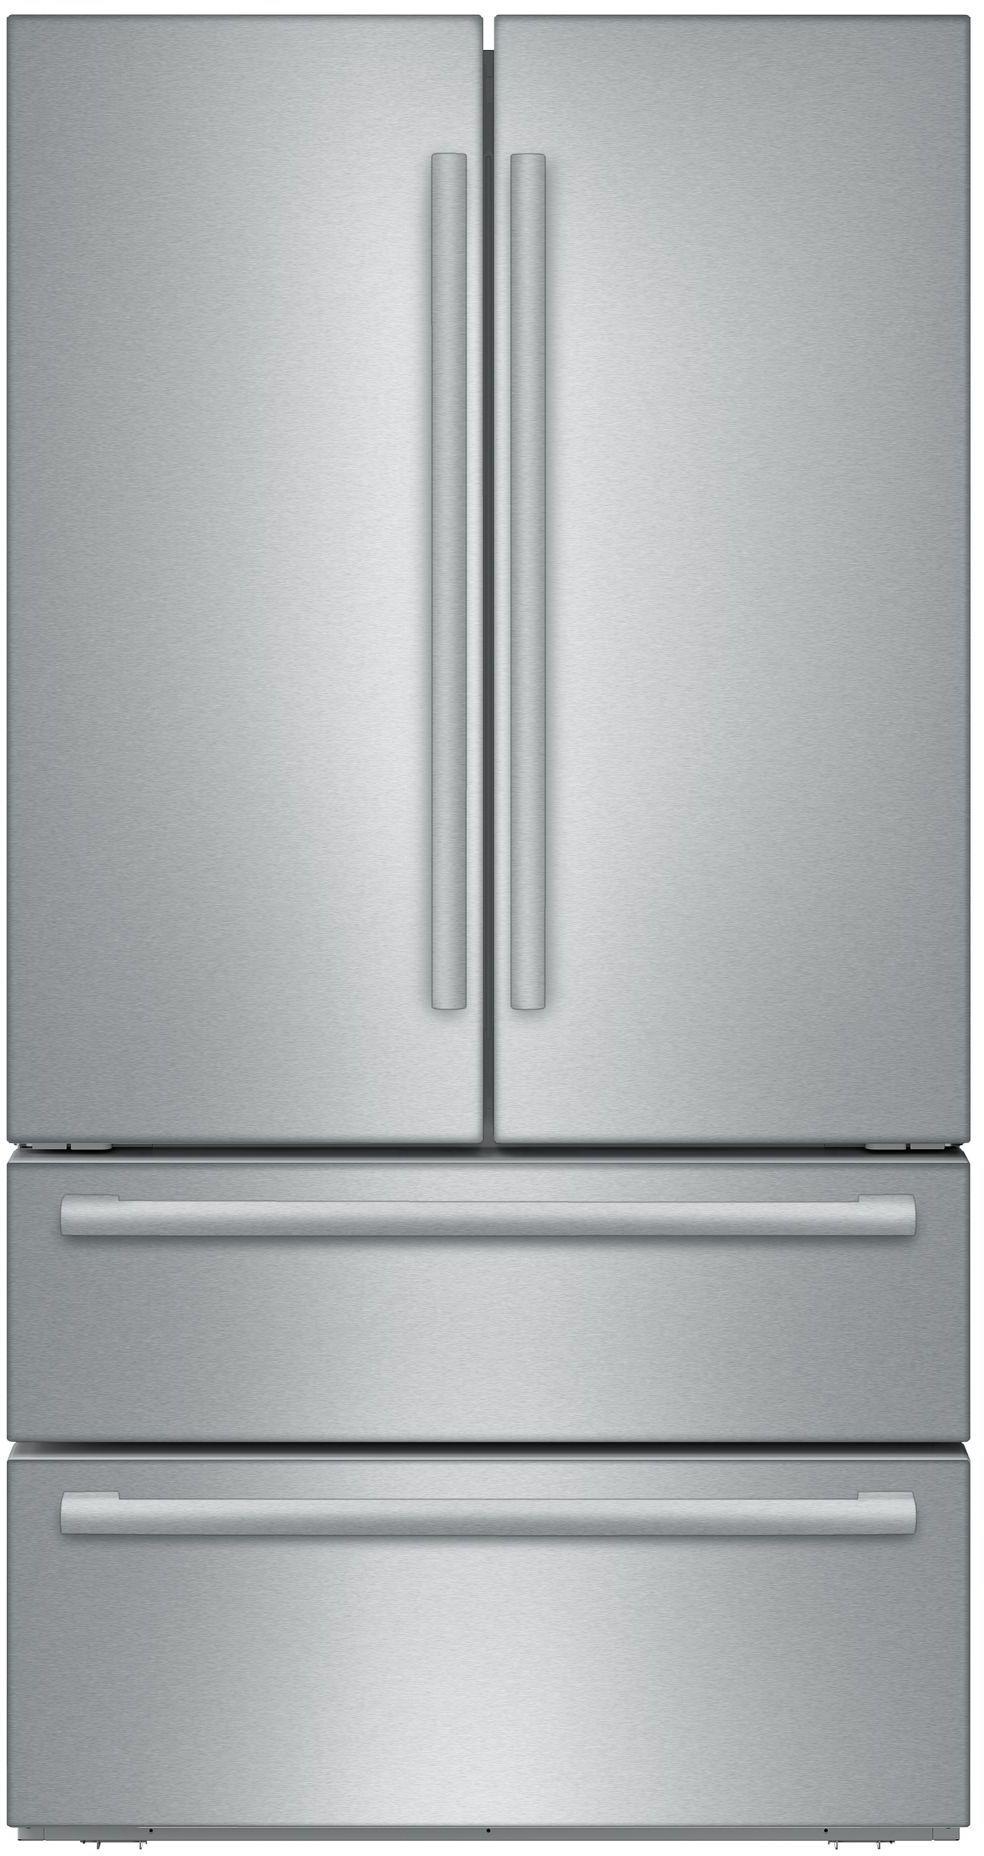 Counter Depth Refrigerator Home Appliances Kitchen Appliances In